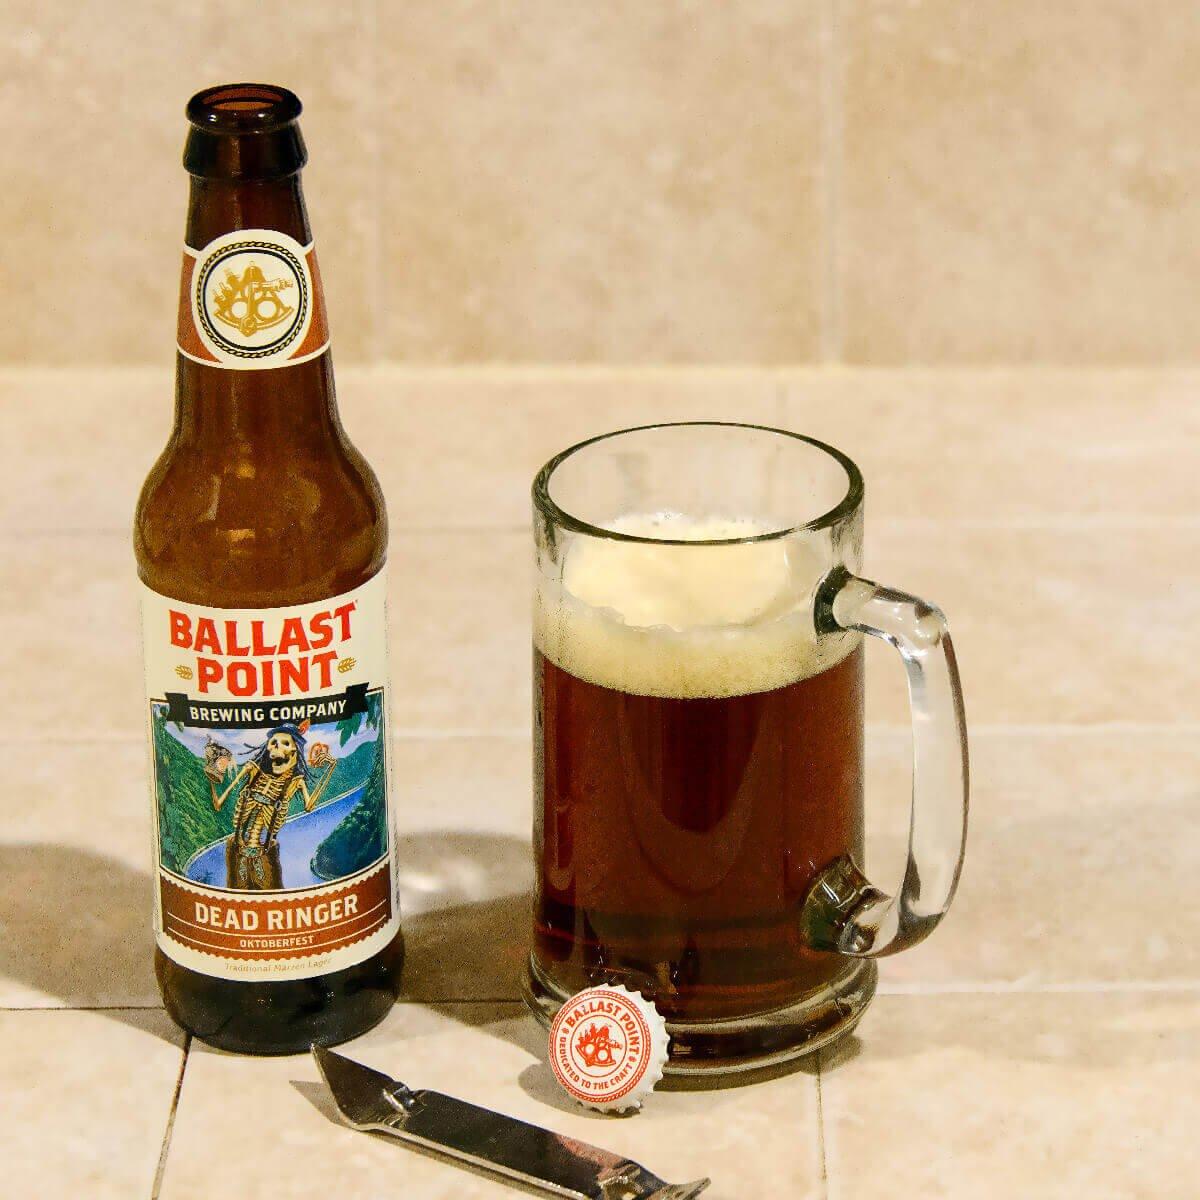 Dead Ringer Oktoberfest brewed by Ballast Point Brewing Company.